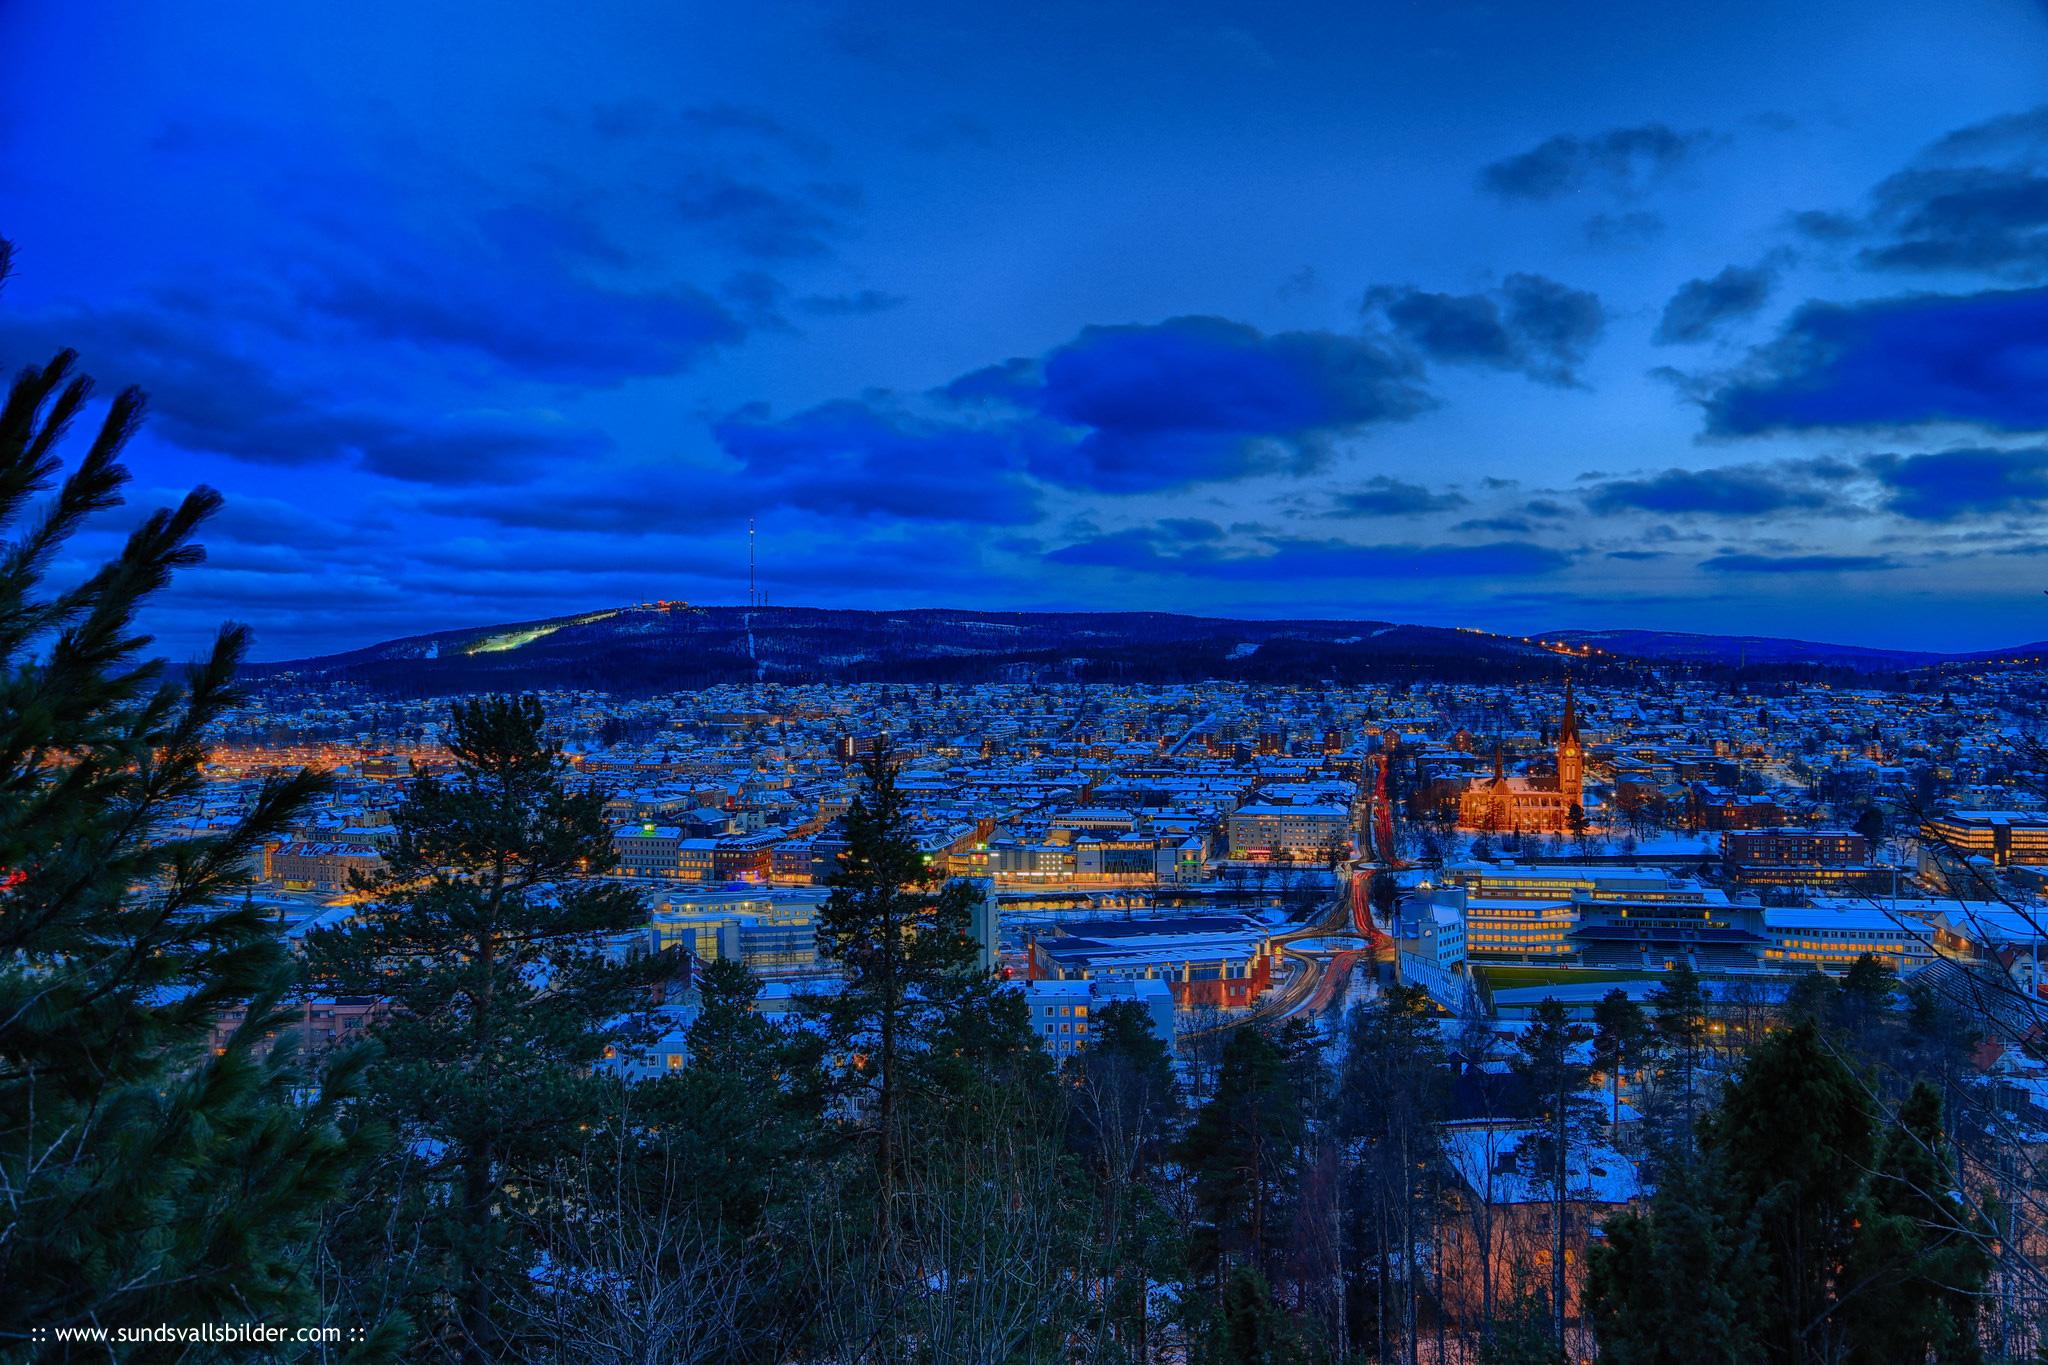 Sundsvall, Sweden, by night.